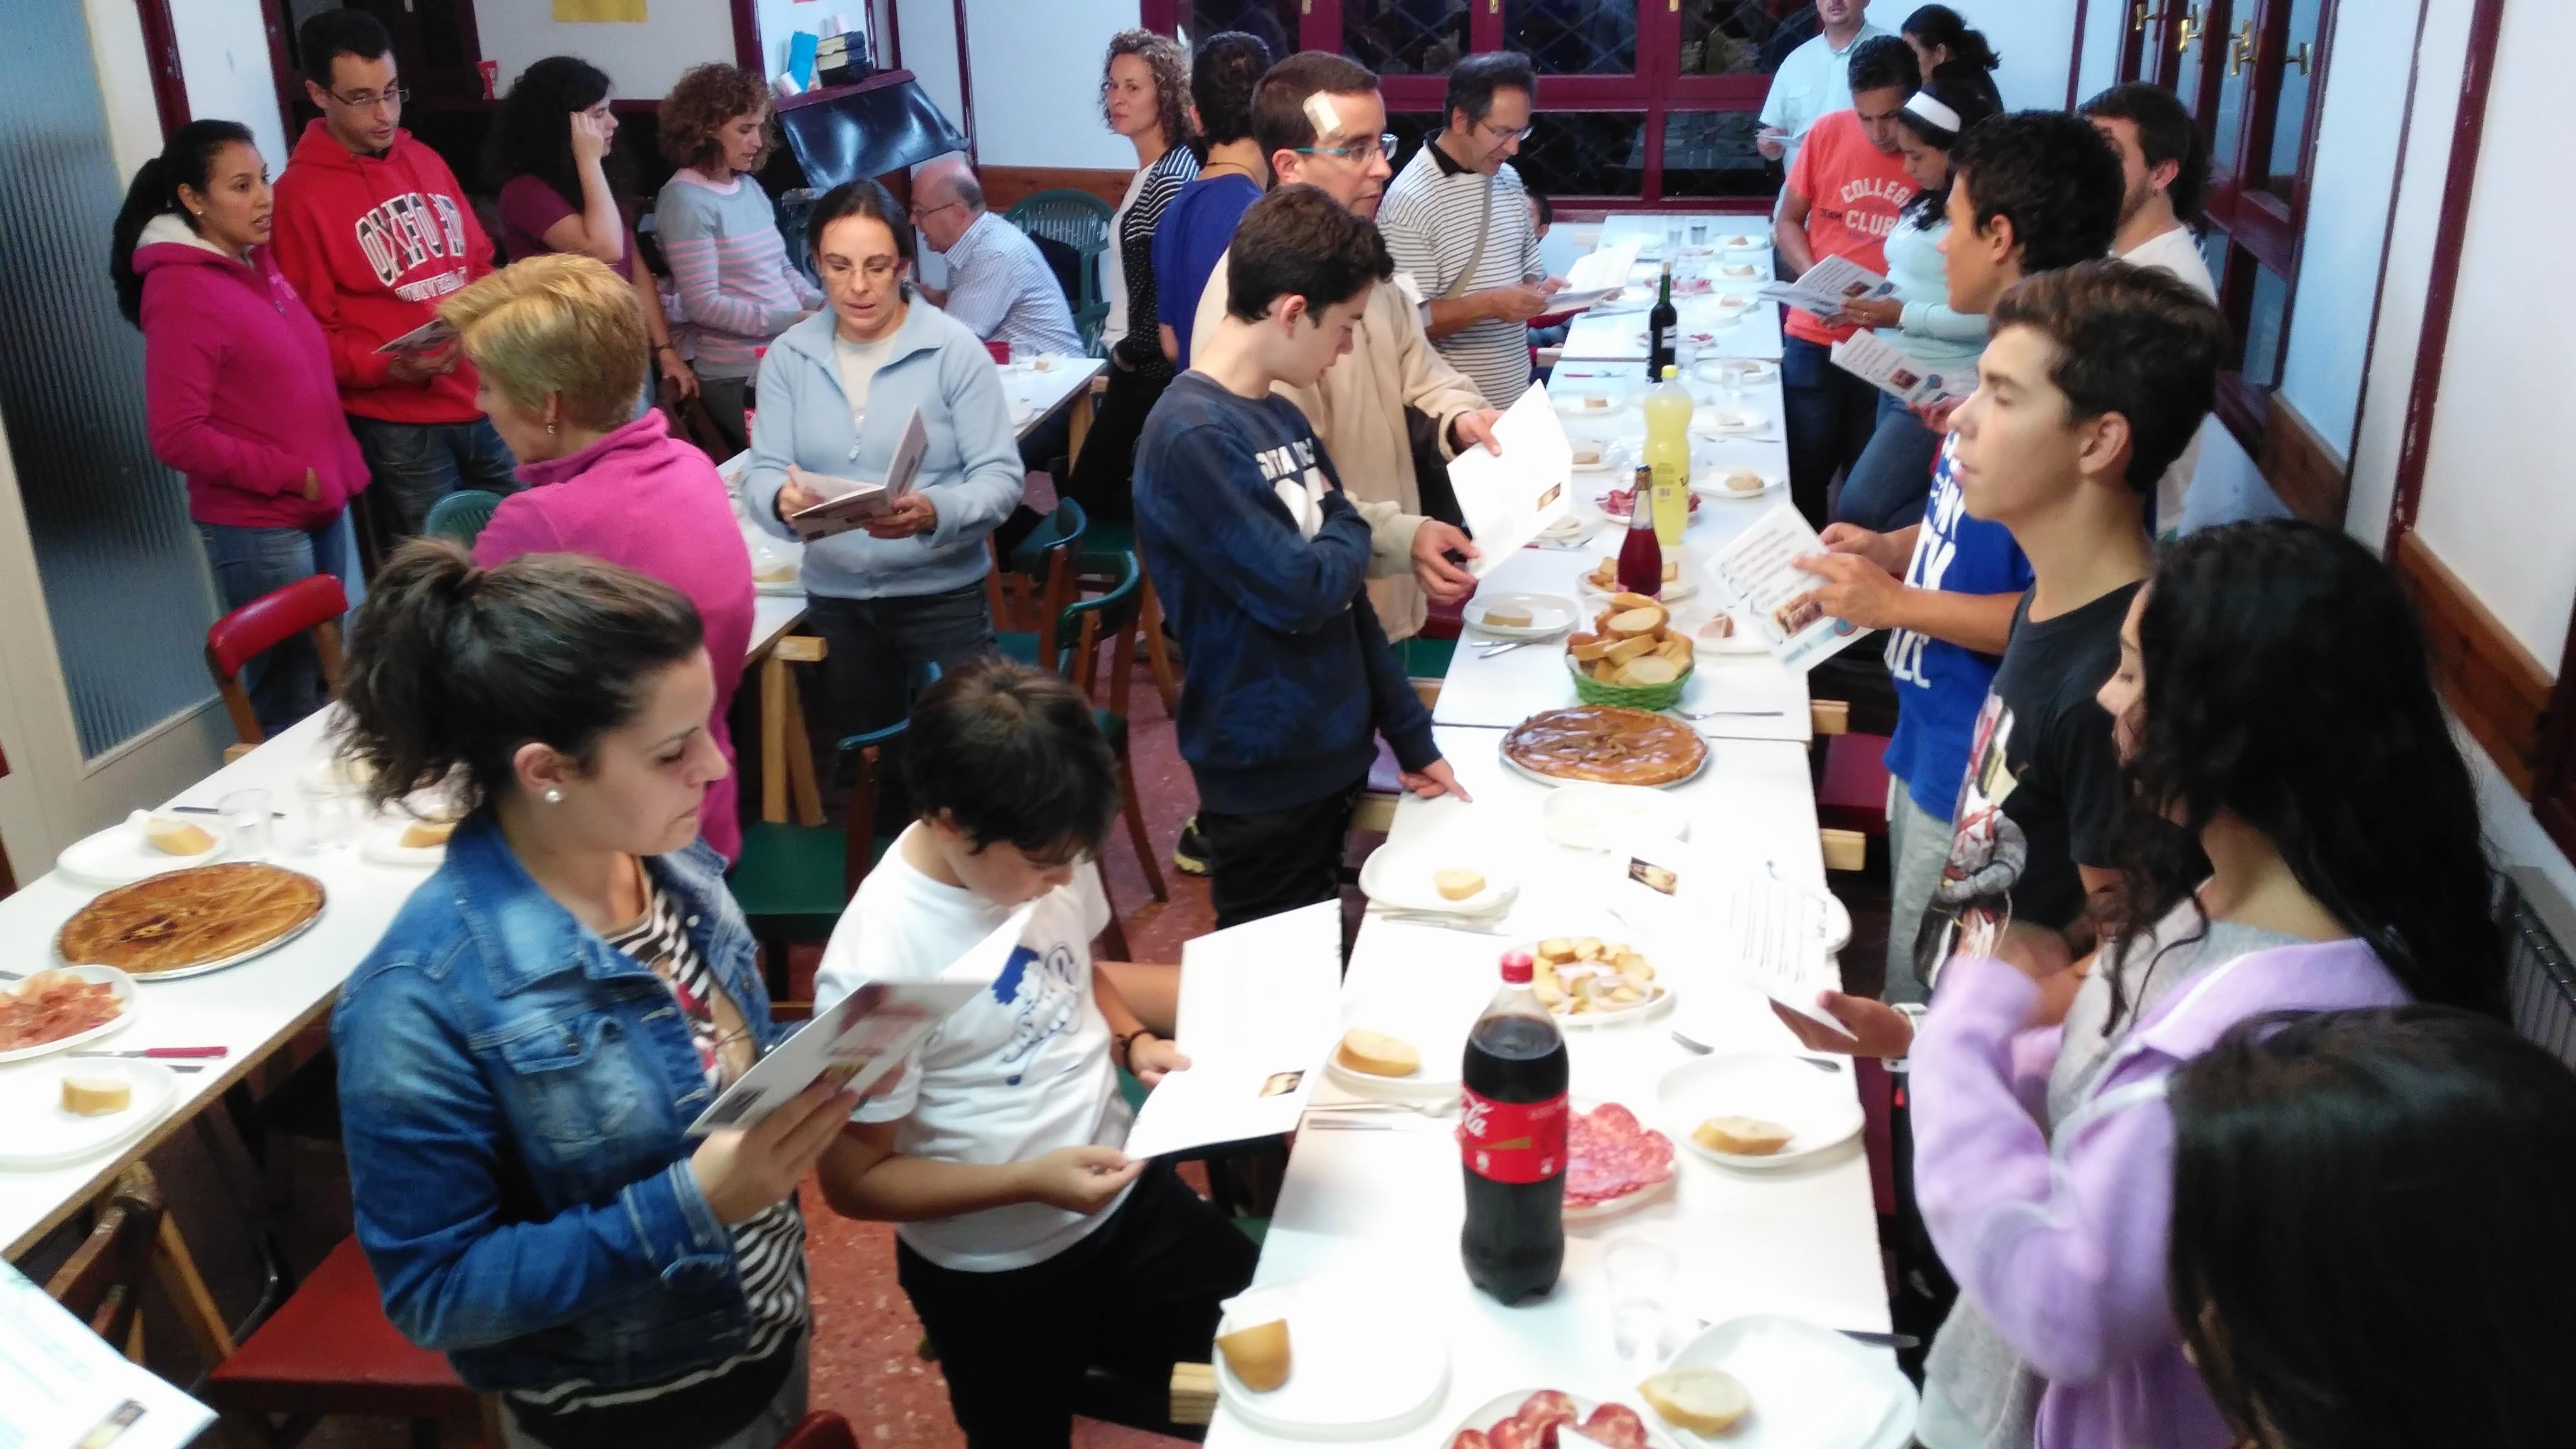 Picasa - 2015.09.12-13 - Convivencia Sector Familias(19).jpg